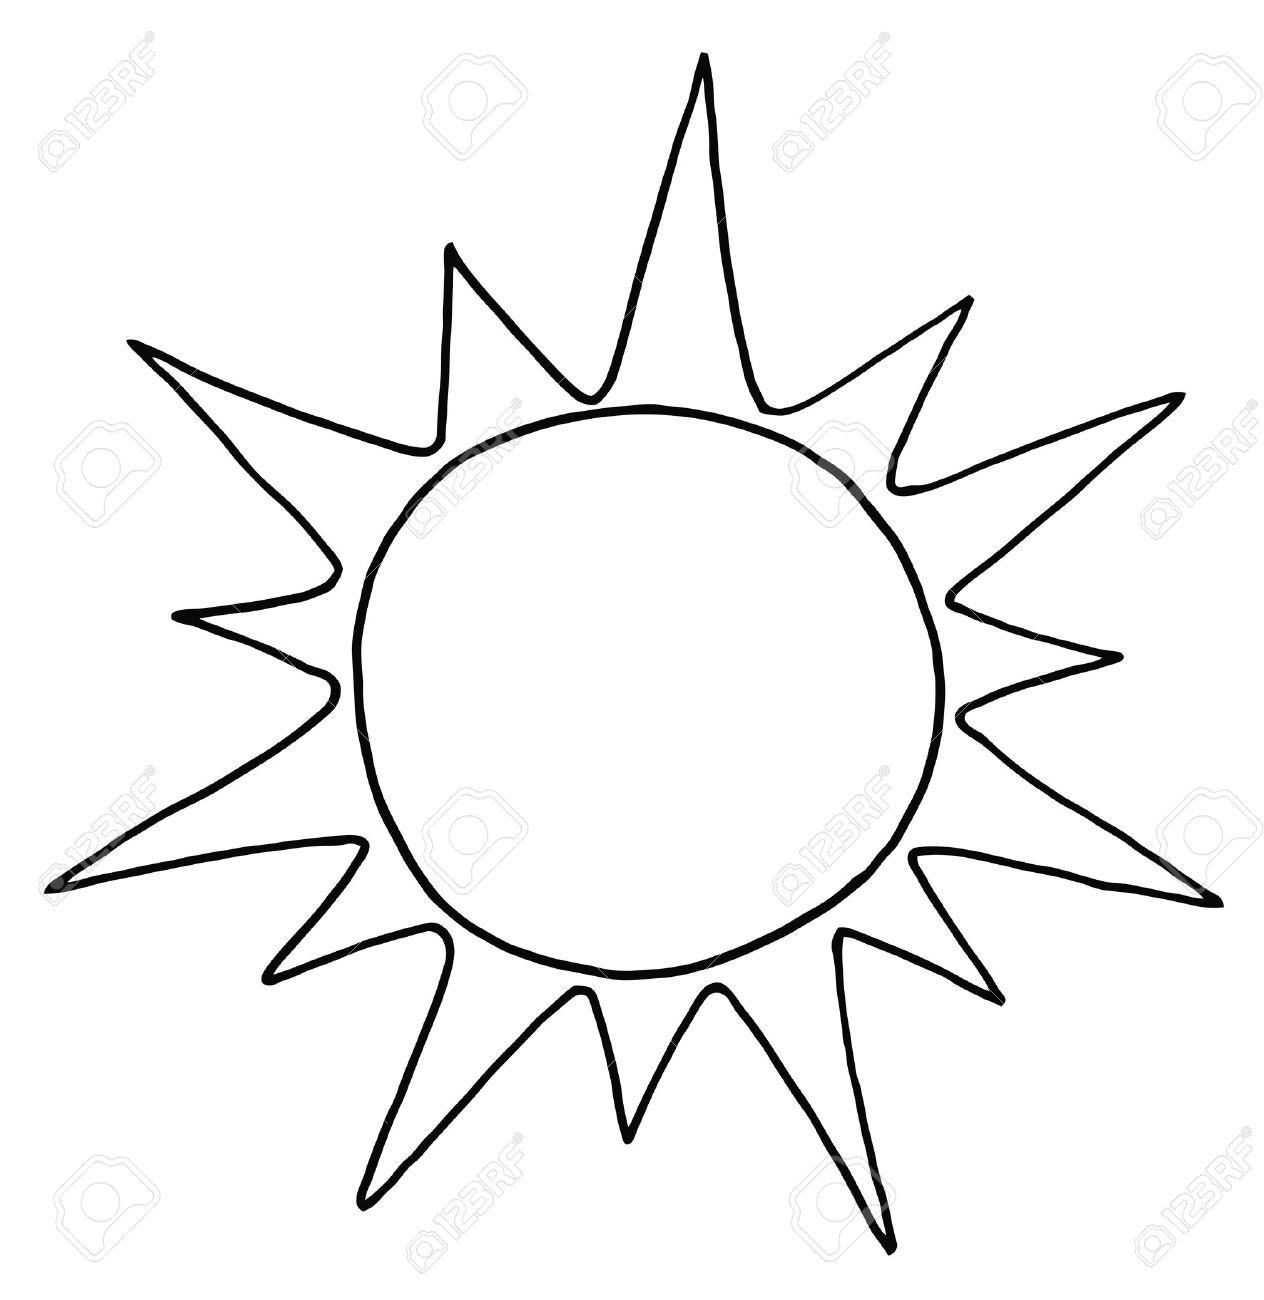 Clipart Sun Black And White - .-Clipart sun black and white - .-3